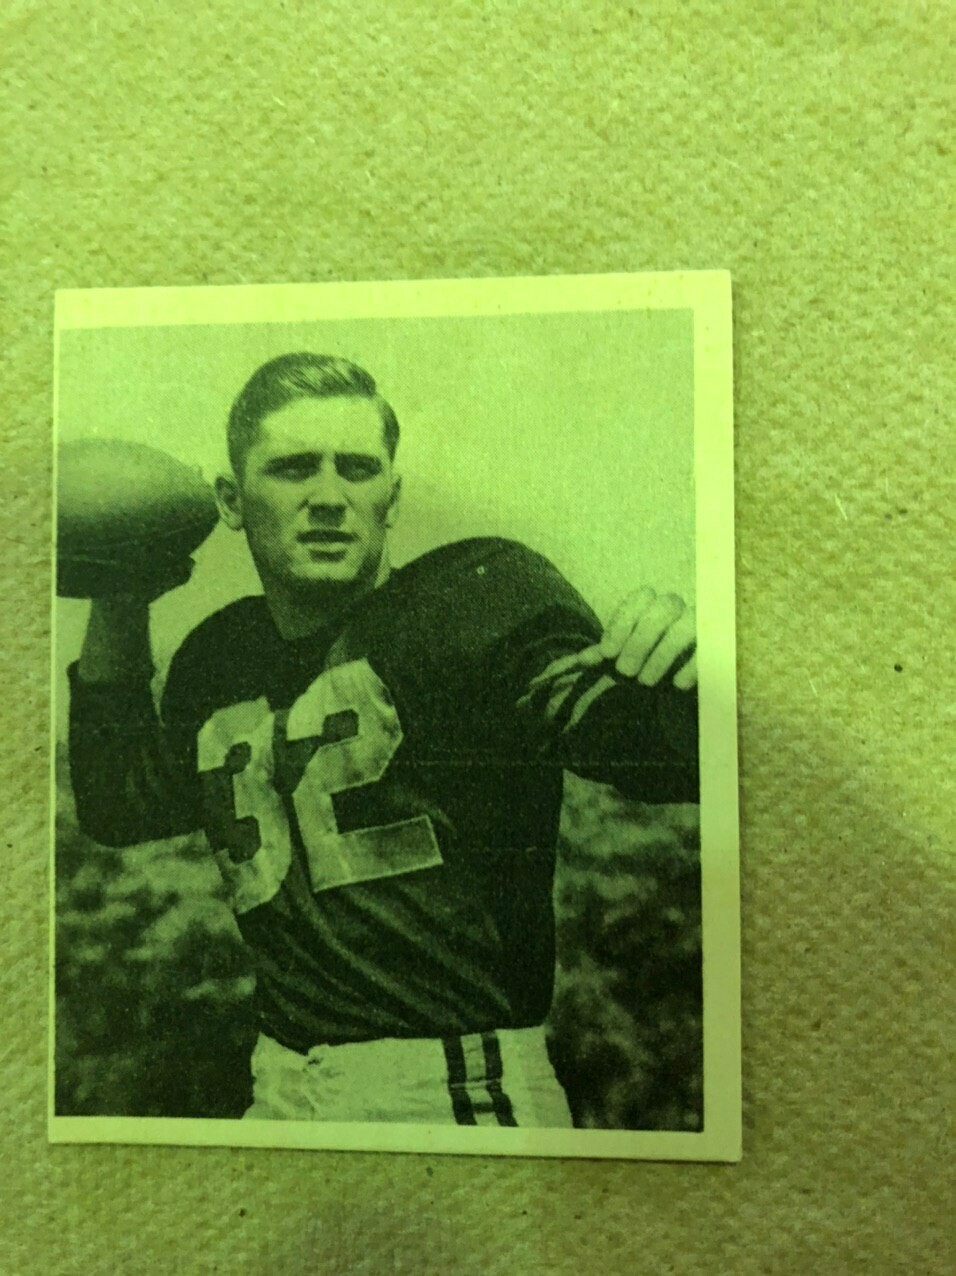 1948 Bowman #3 Johnny Lujack rookie, List #350, Sell $195